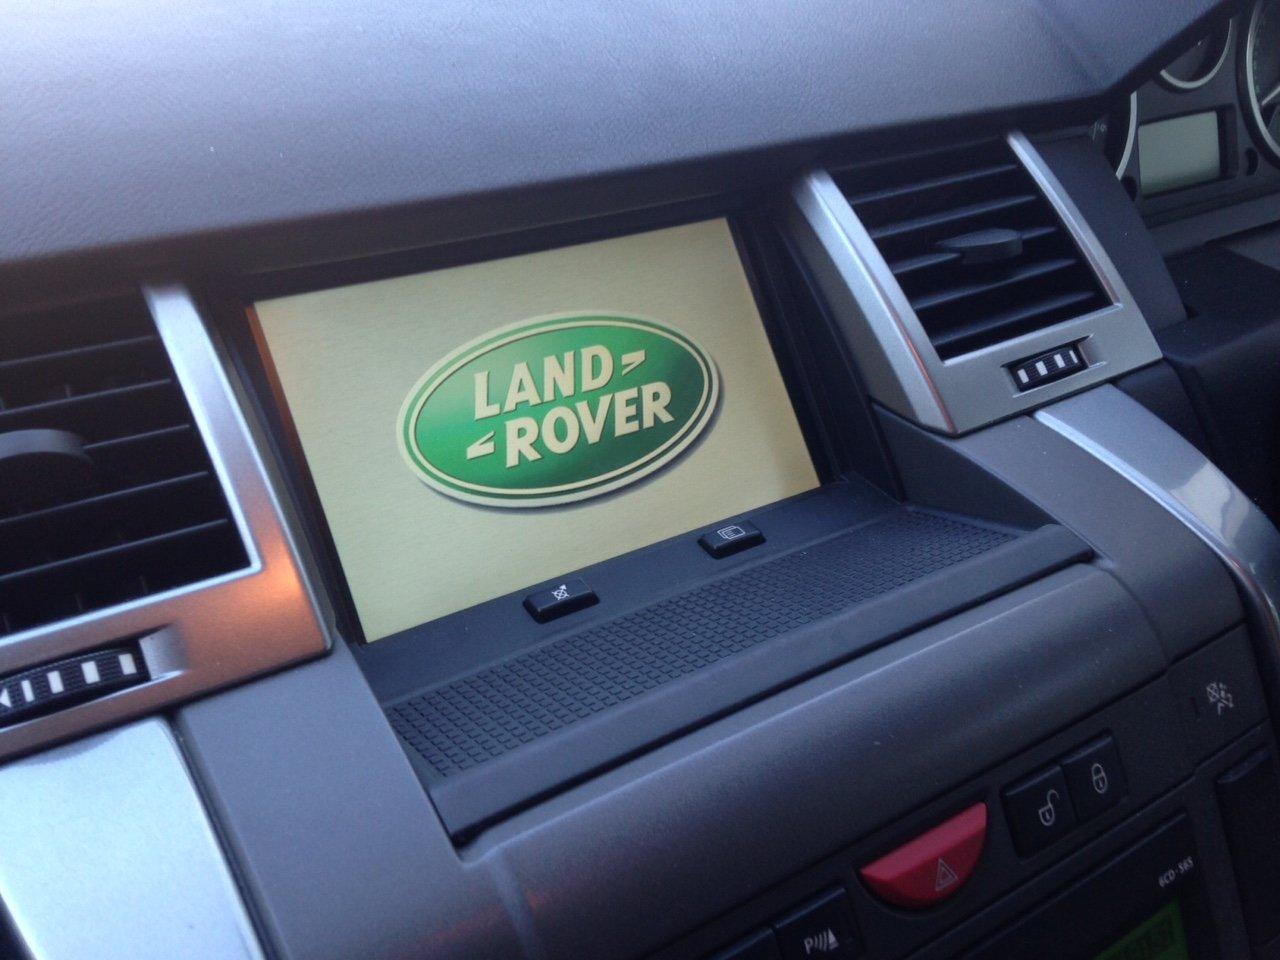 FAH500210  FAH500190 Range Rover Sport Dashboard Rubber Mat for 2005-2009 Models with Navigation